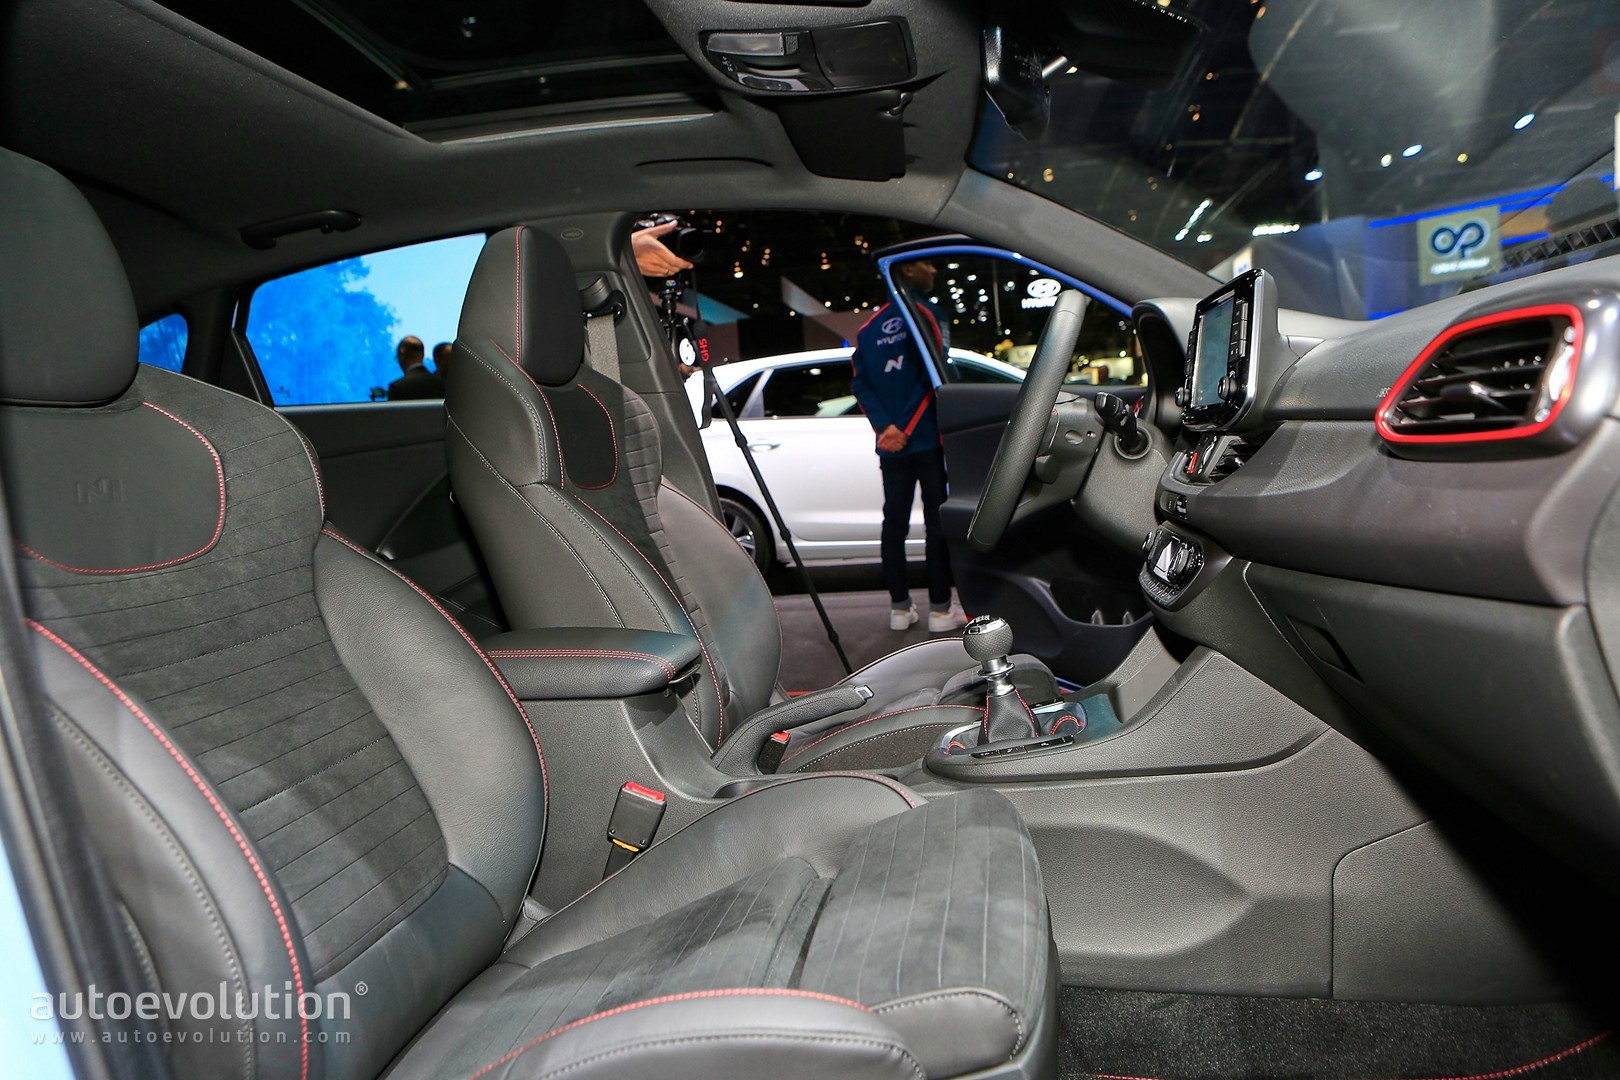 Hyundai Sonata Power Seat Wiring Trusted Diagrams. 2015 Hyundai Sonata Recalled Over Wiring Problem Autoevolution Review I30 Fastback N. Hyundai. 2015 Hyundai Sonata Wiring At Scoala.co